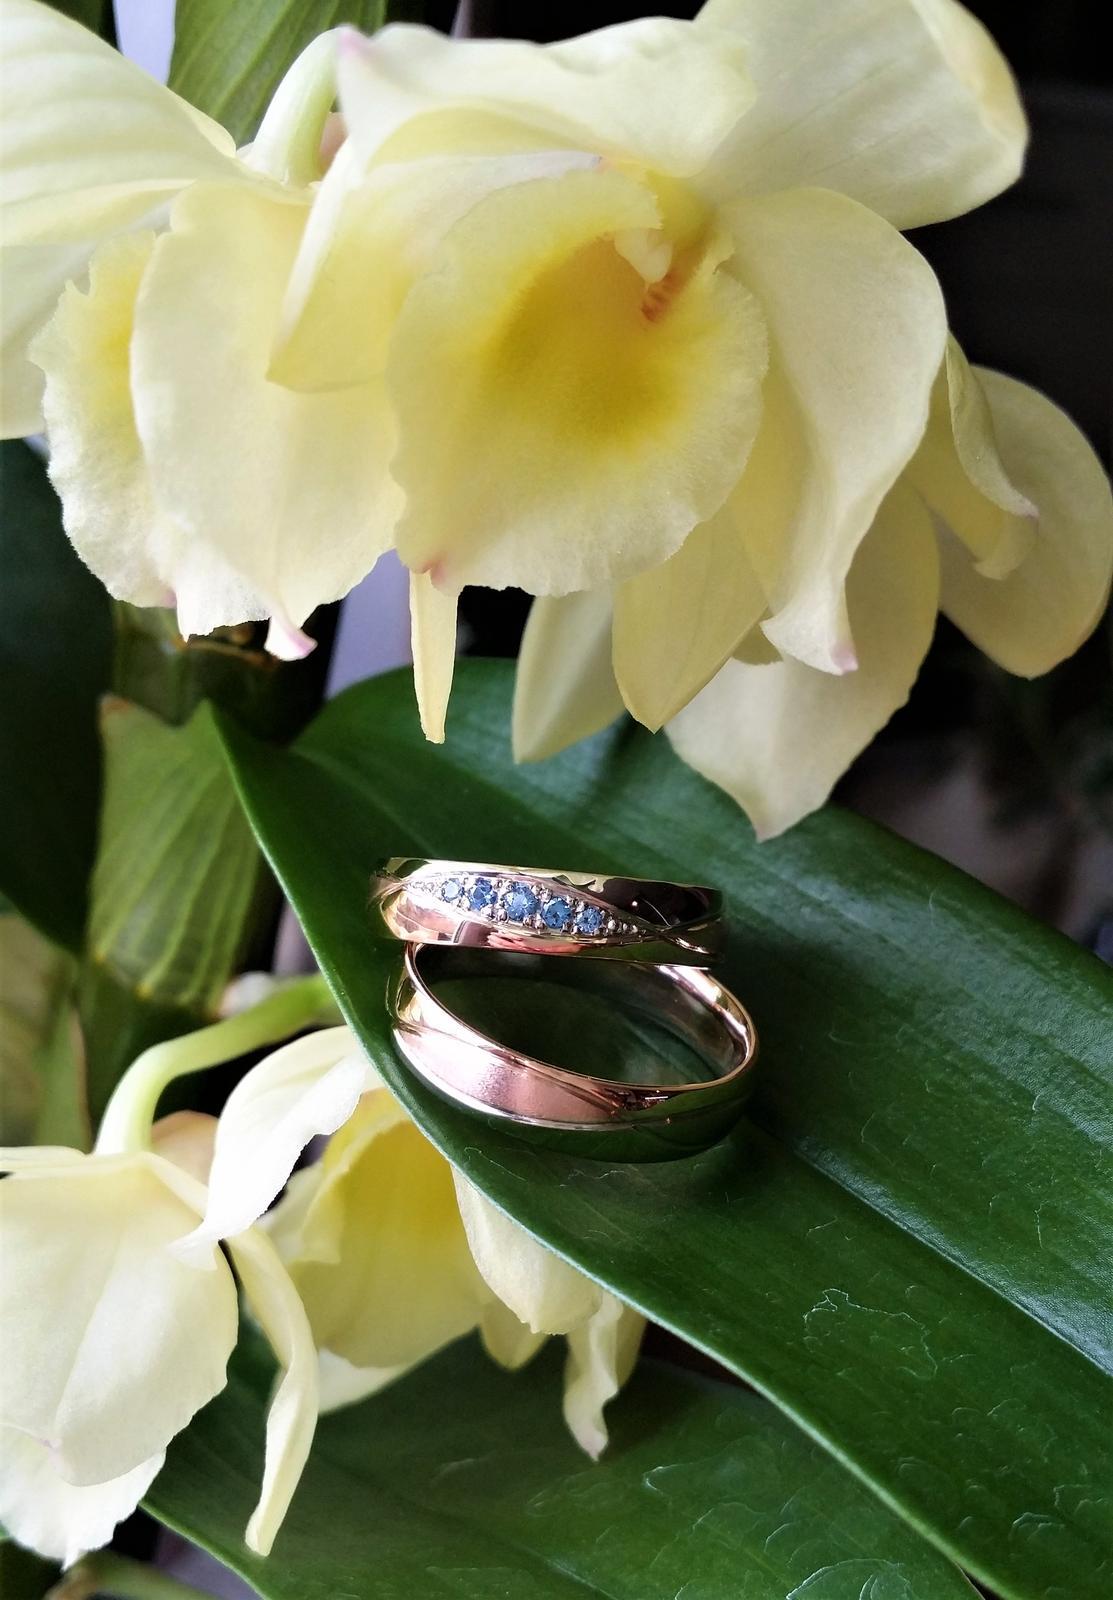 Aqua modrý diamant - Obrázek č. 1